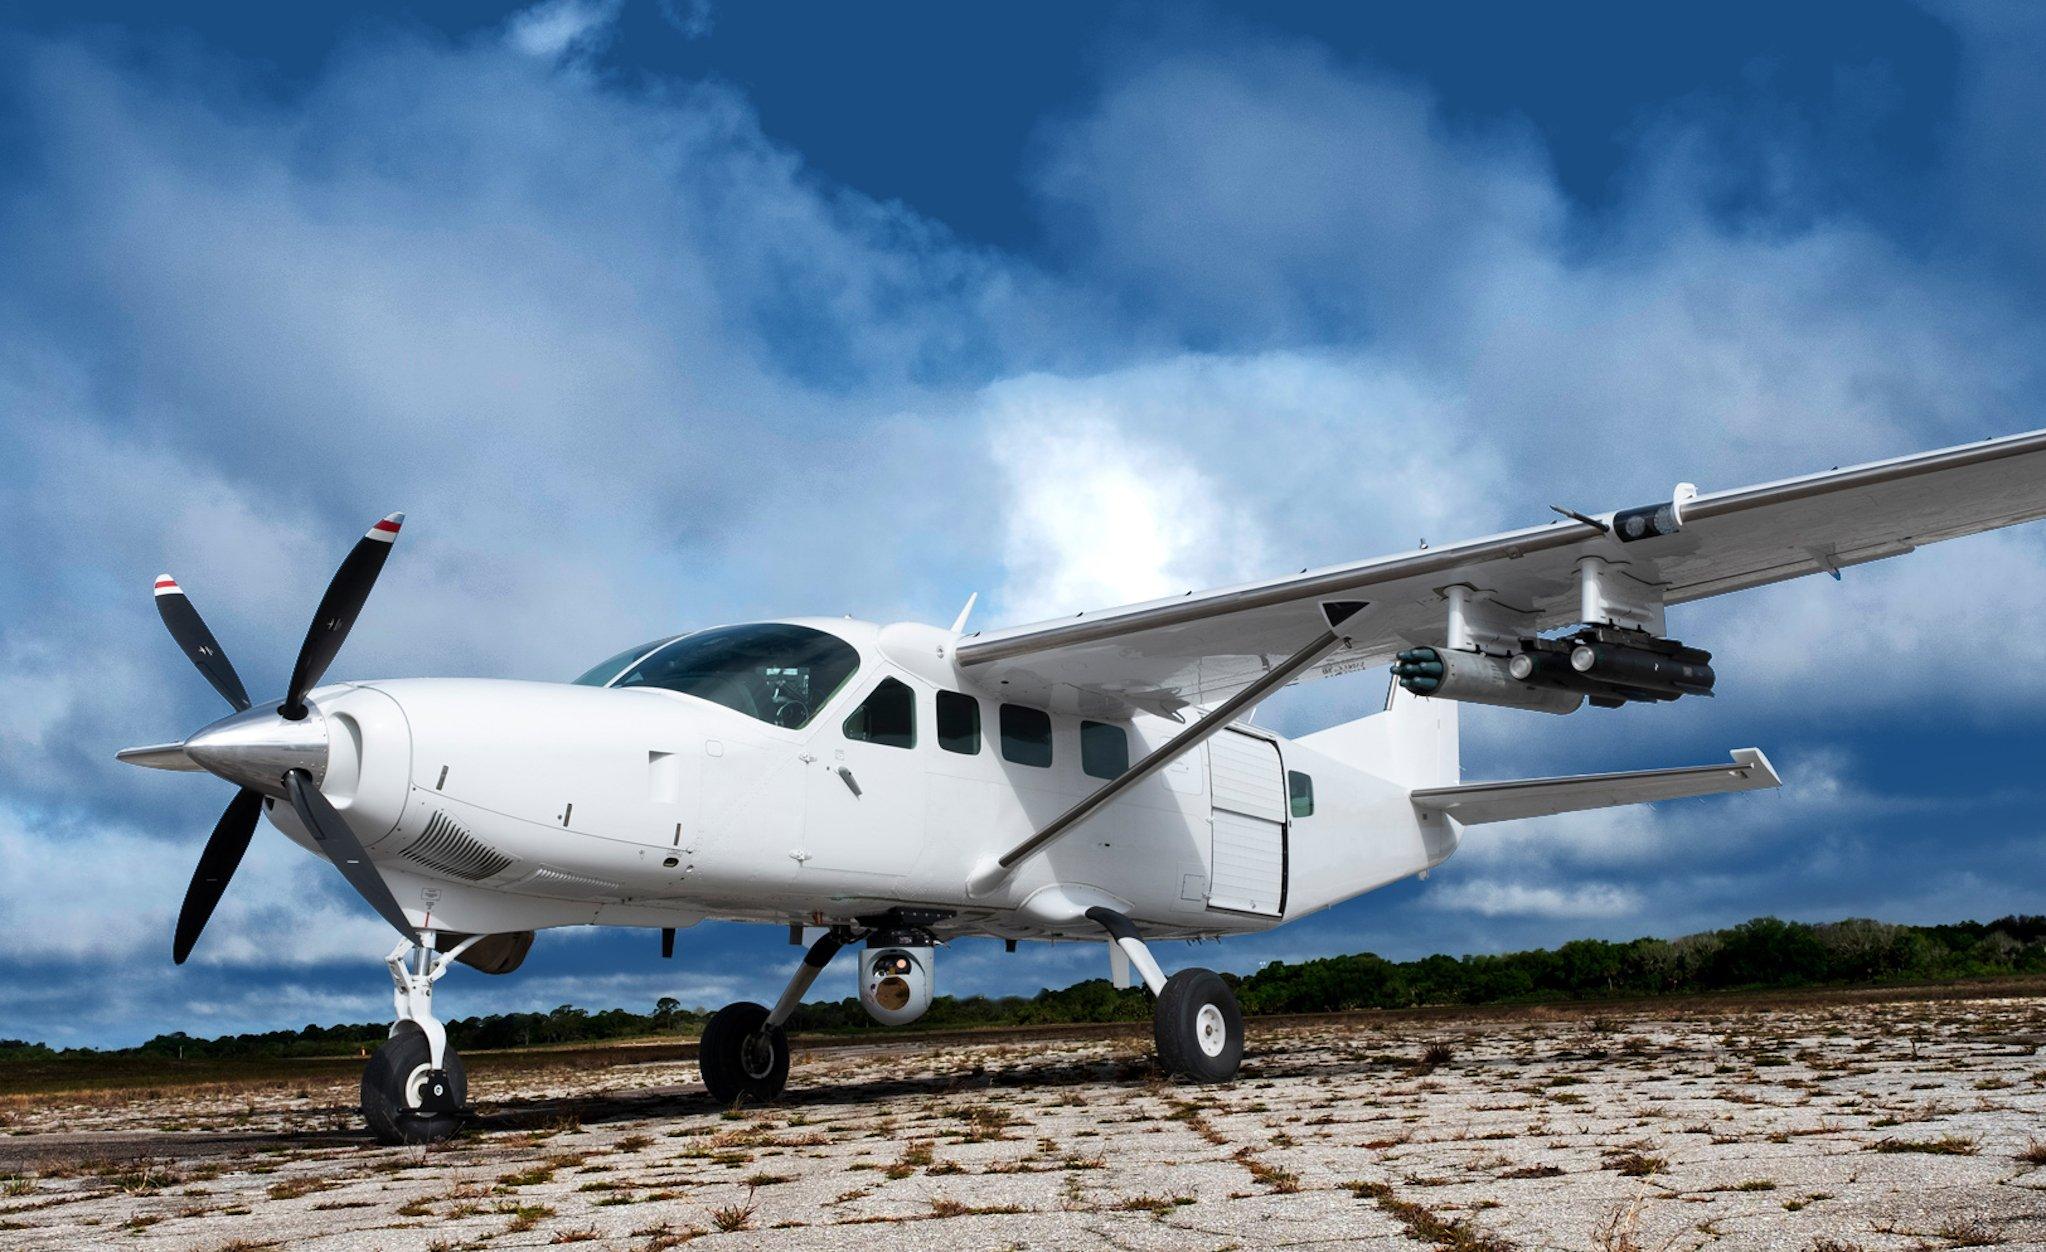 MC-208 Guardian [MAG Aerospace]